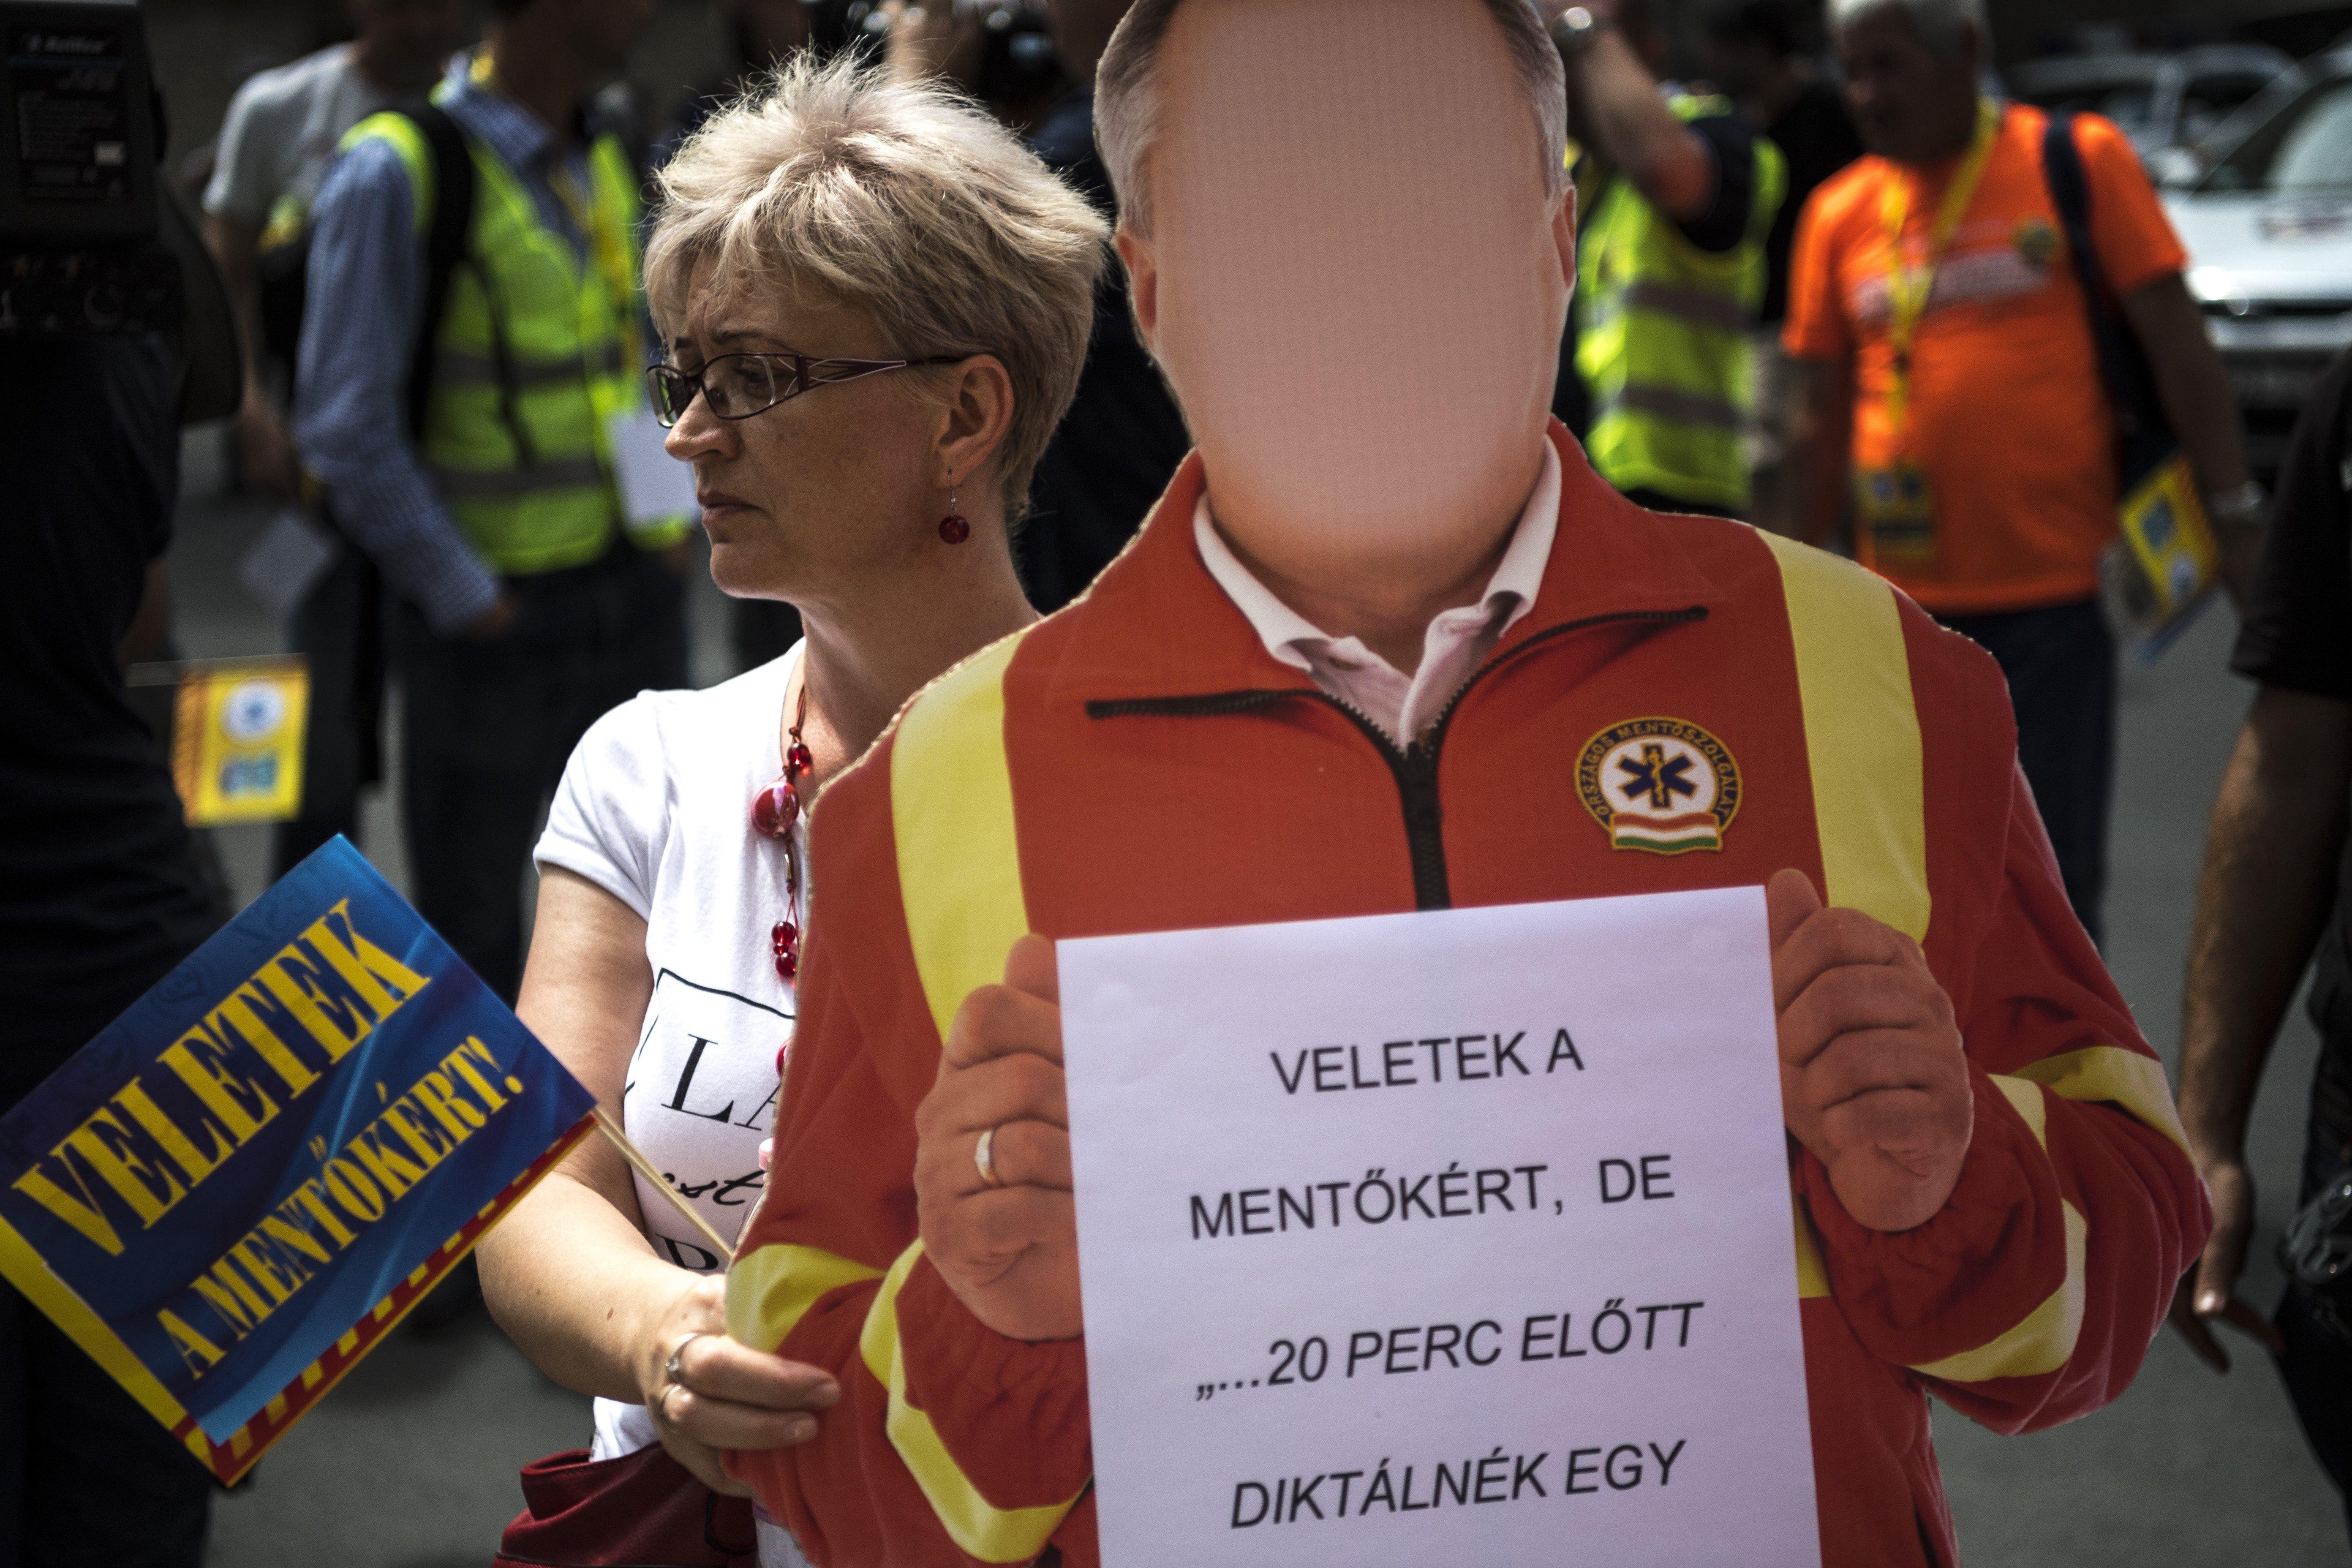 Mentősök tüntettek Budapesten